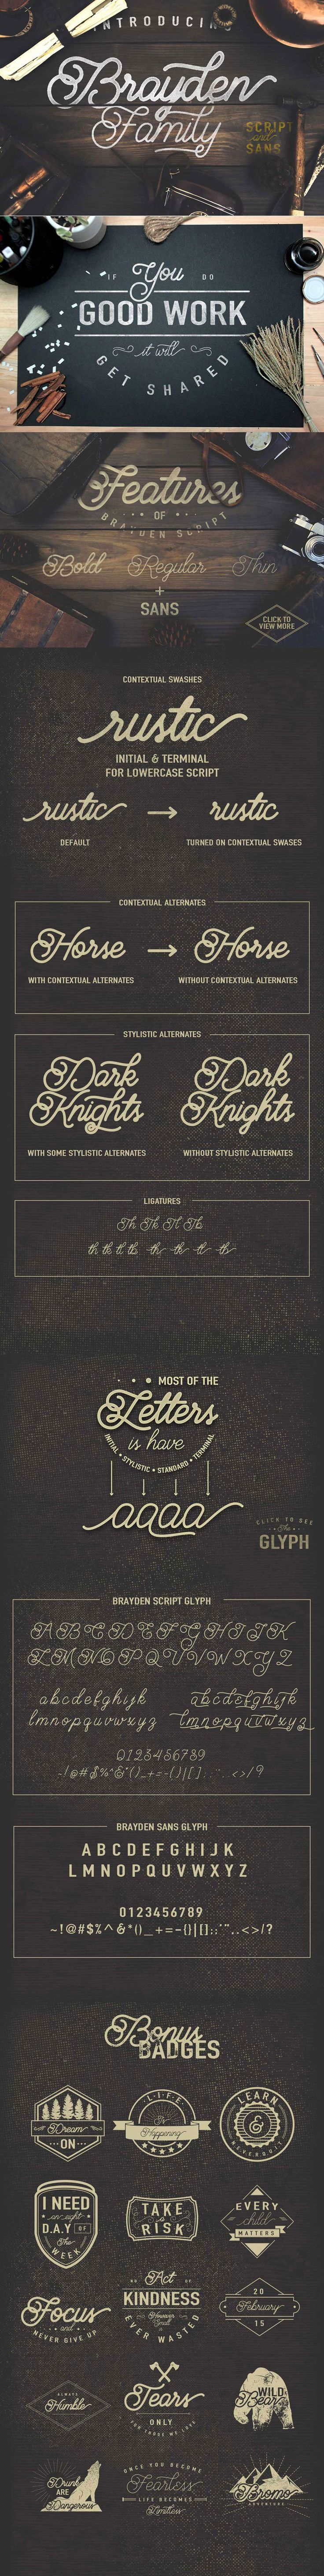 Brayden - a new vintage-style script font.